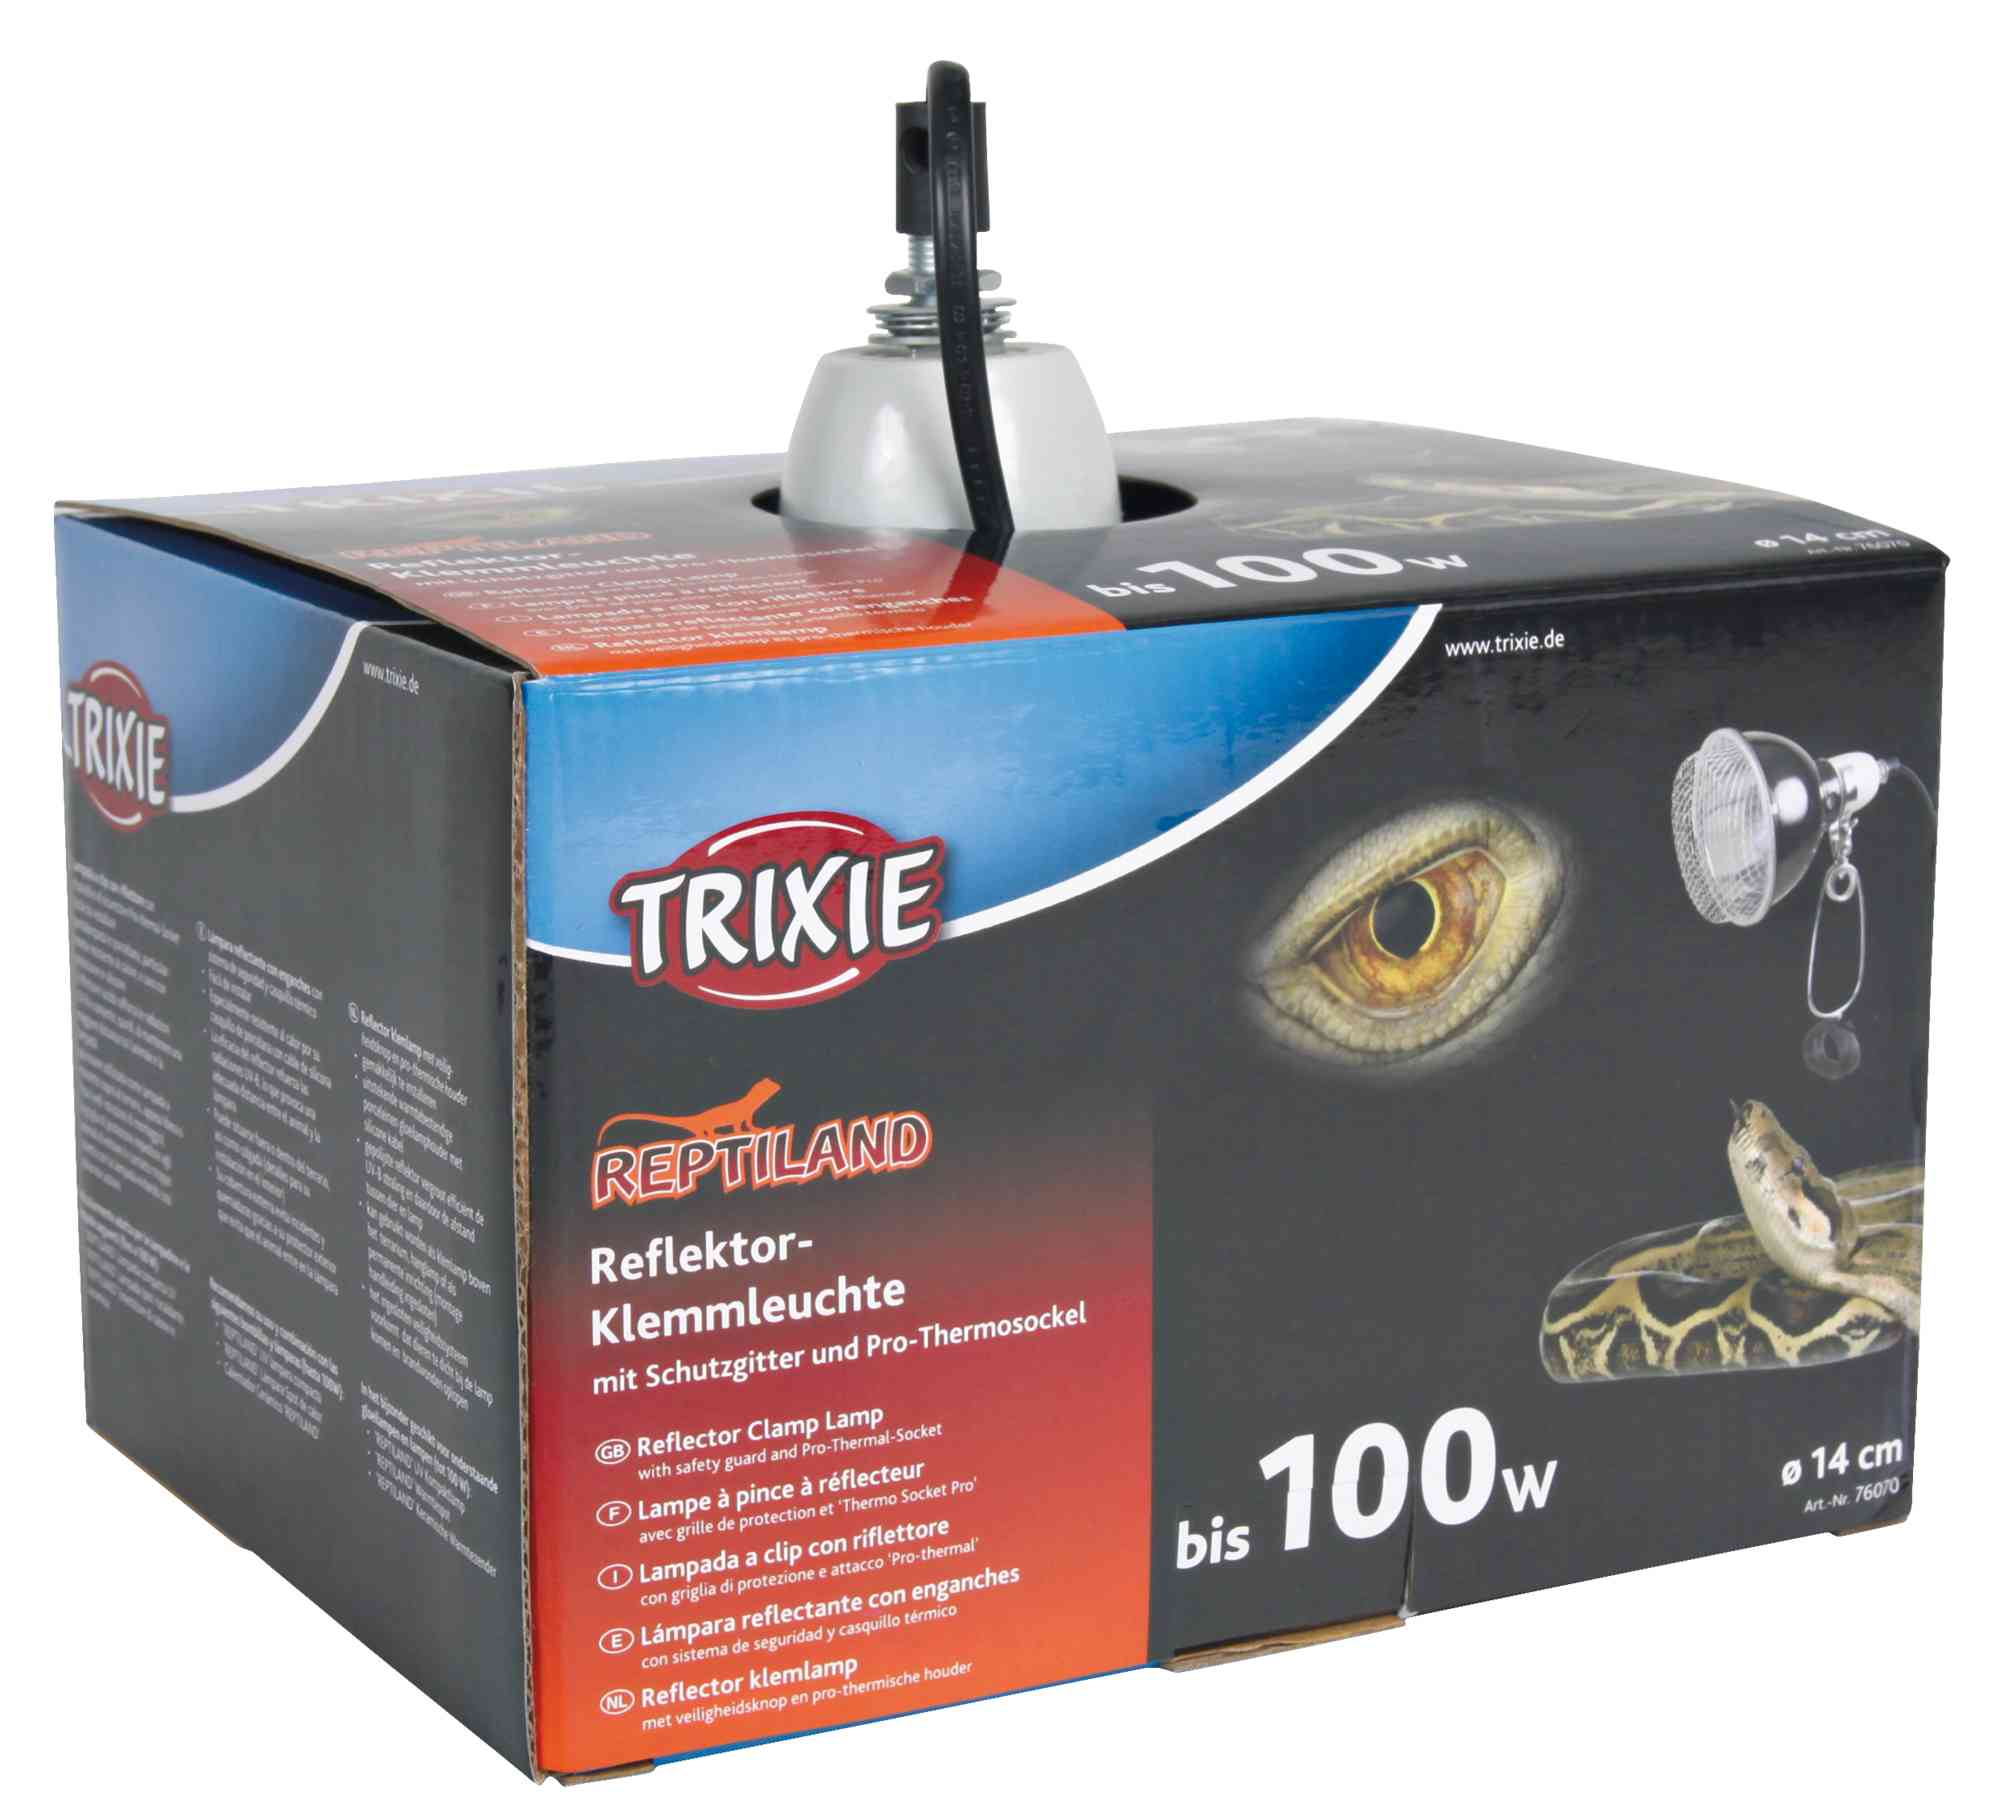 TRIXIE Reflektor-Klemmleuchte, ø 14 × 17 cm